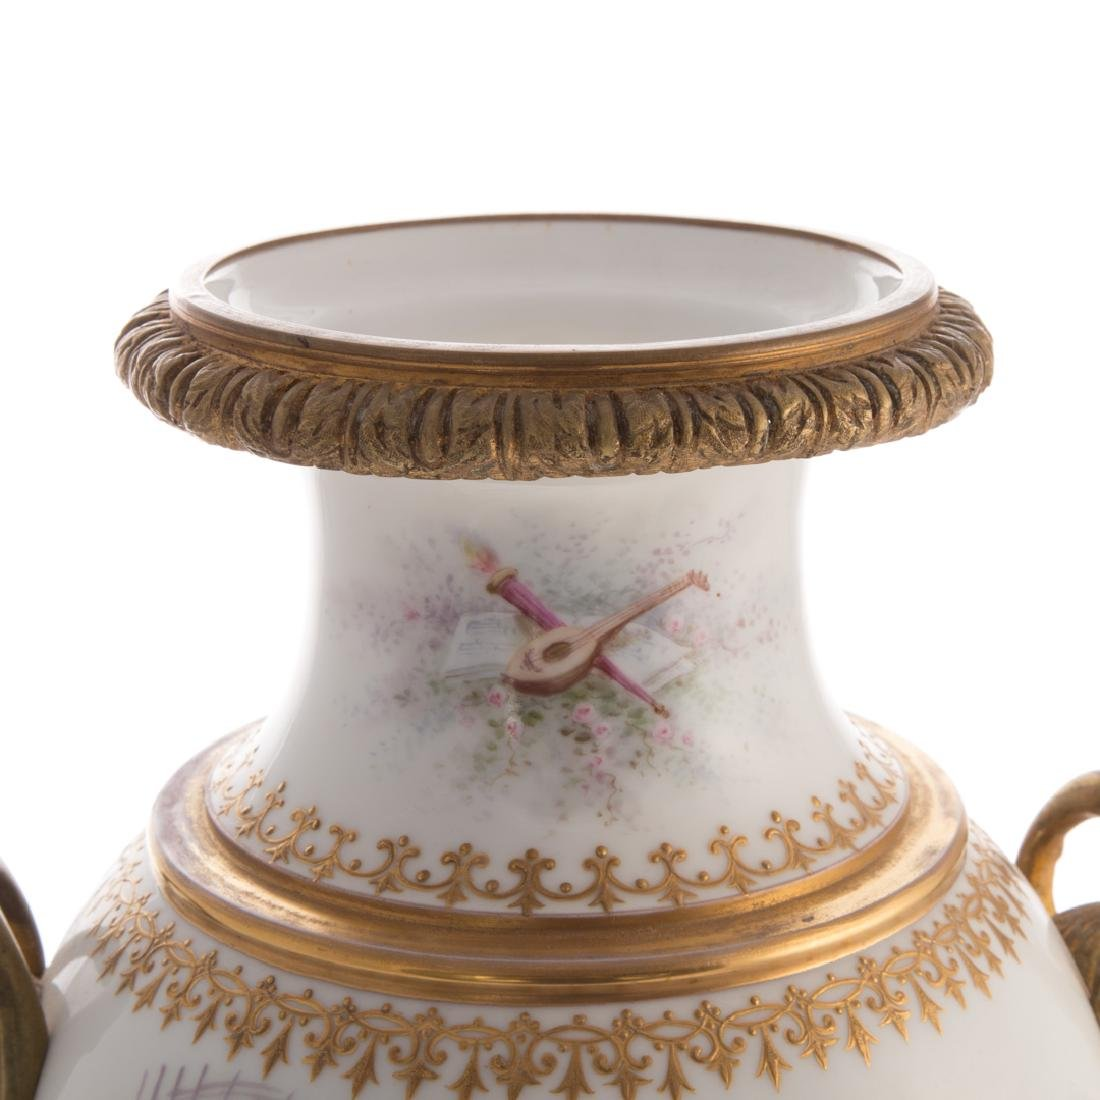 French Sevres style porcelain vase - 7